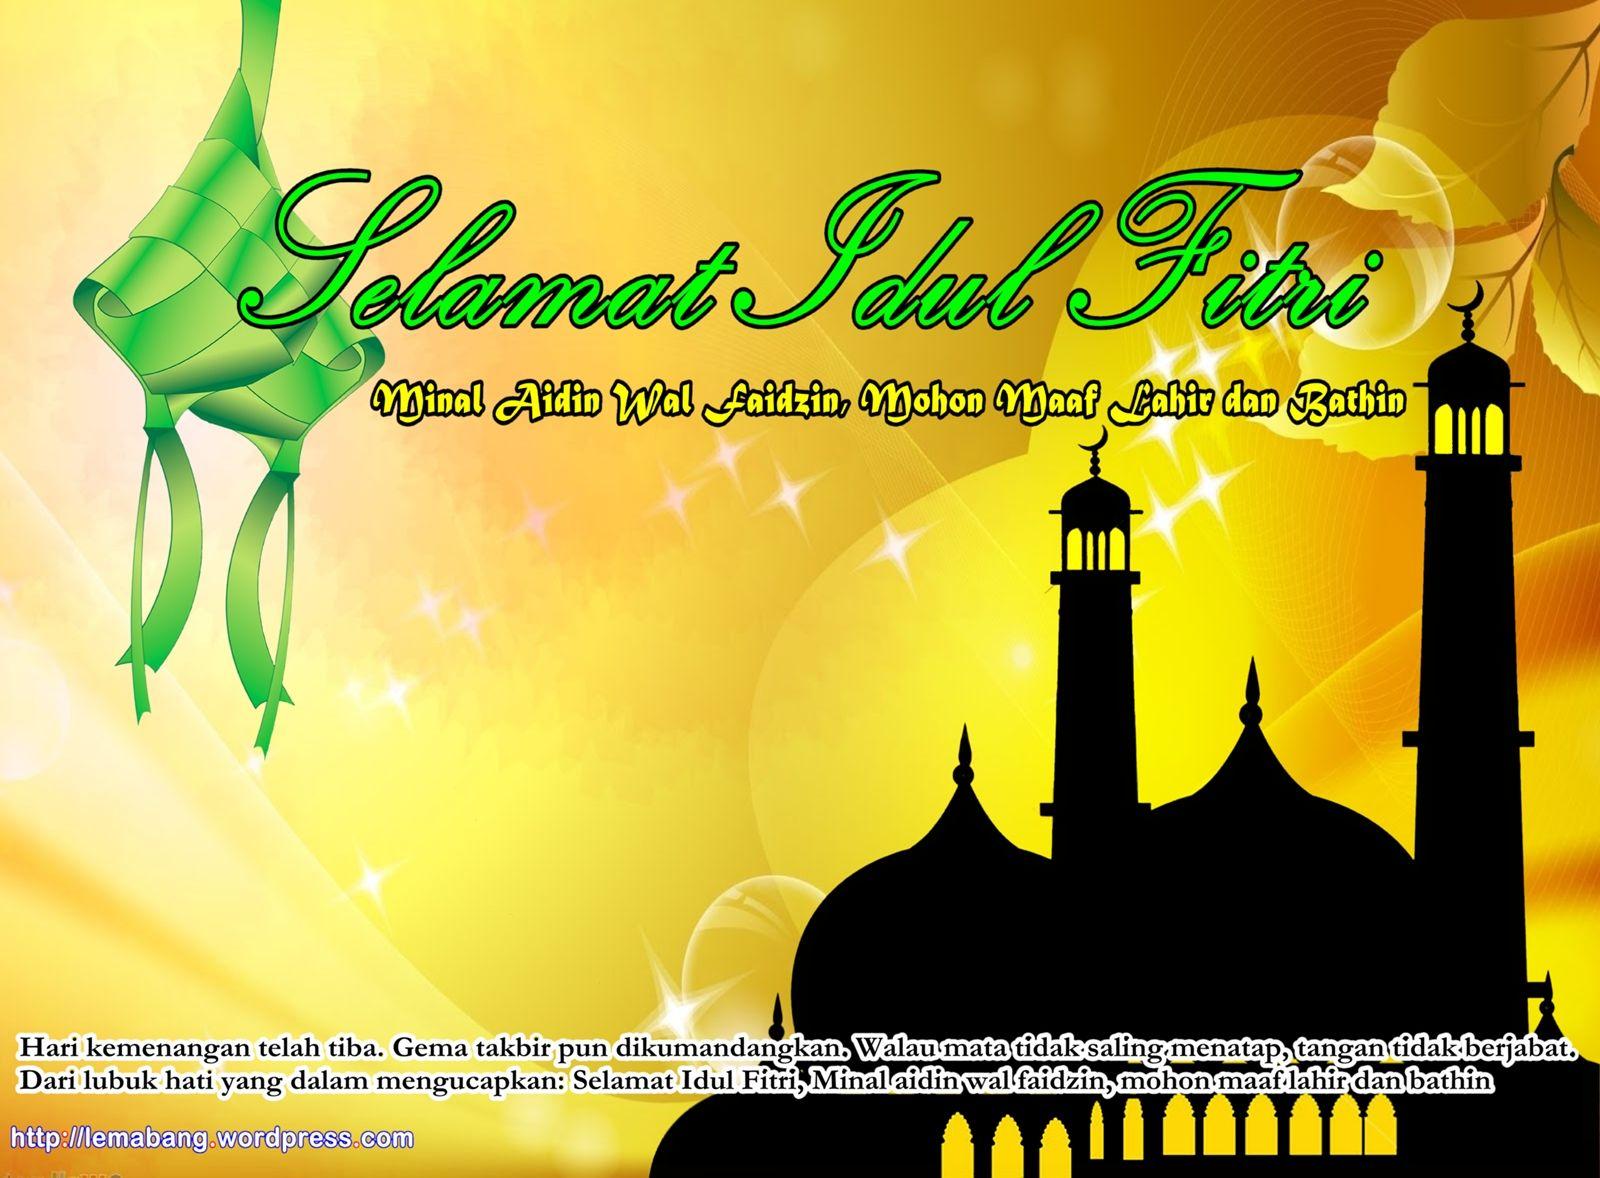 Kartu Ucapan Selamat Lebaran Idul Fitri 2014 Greetings Pinterest